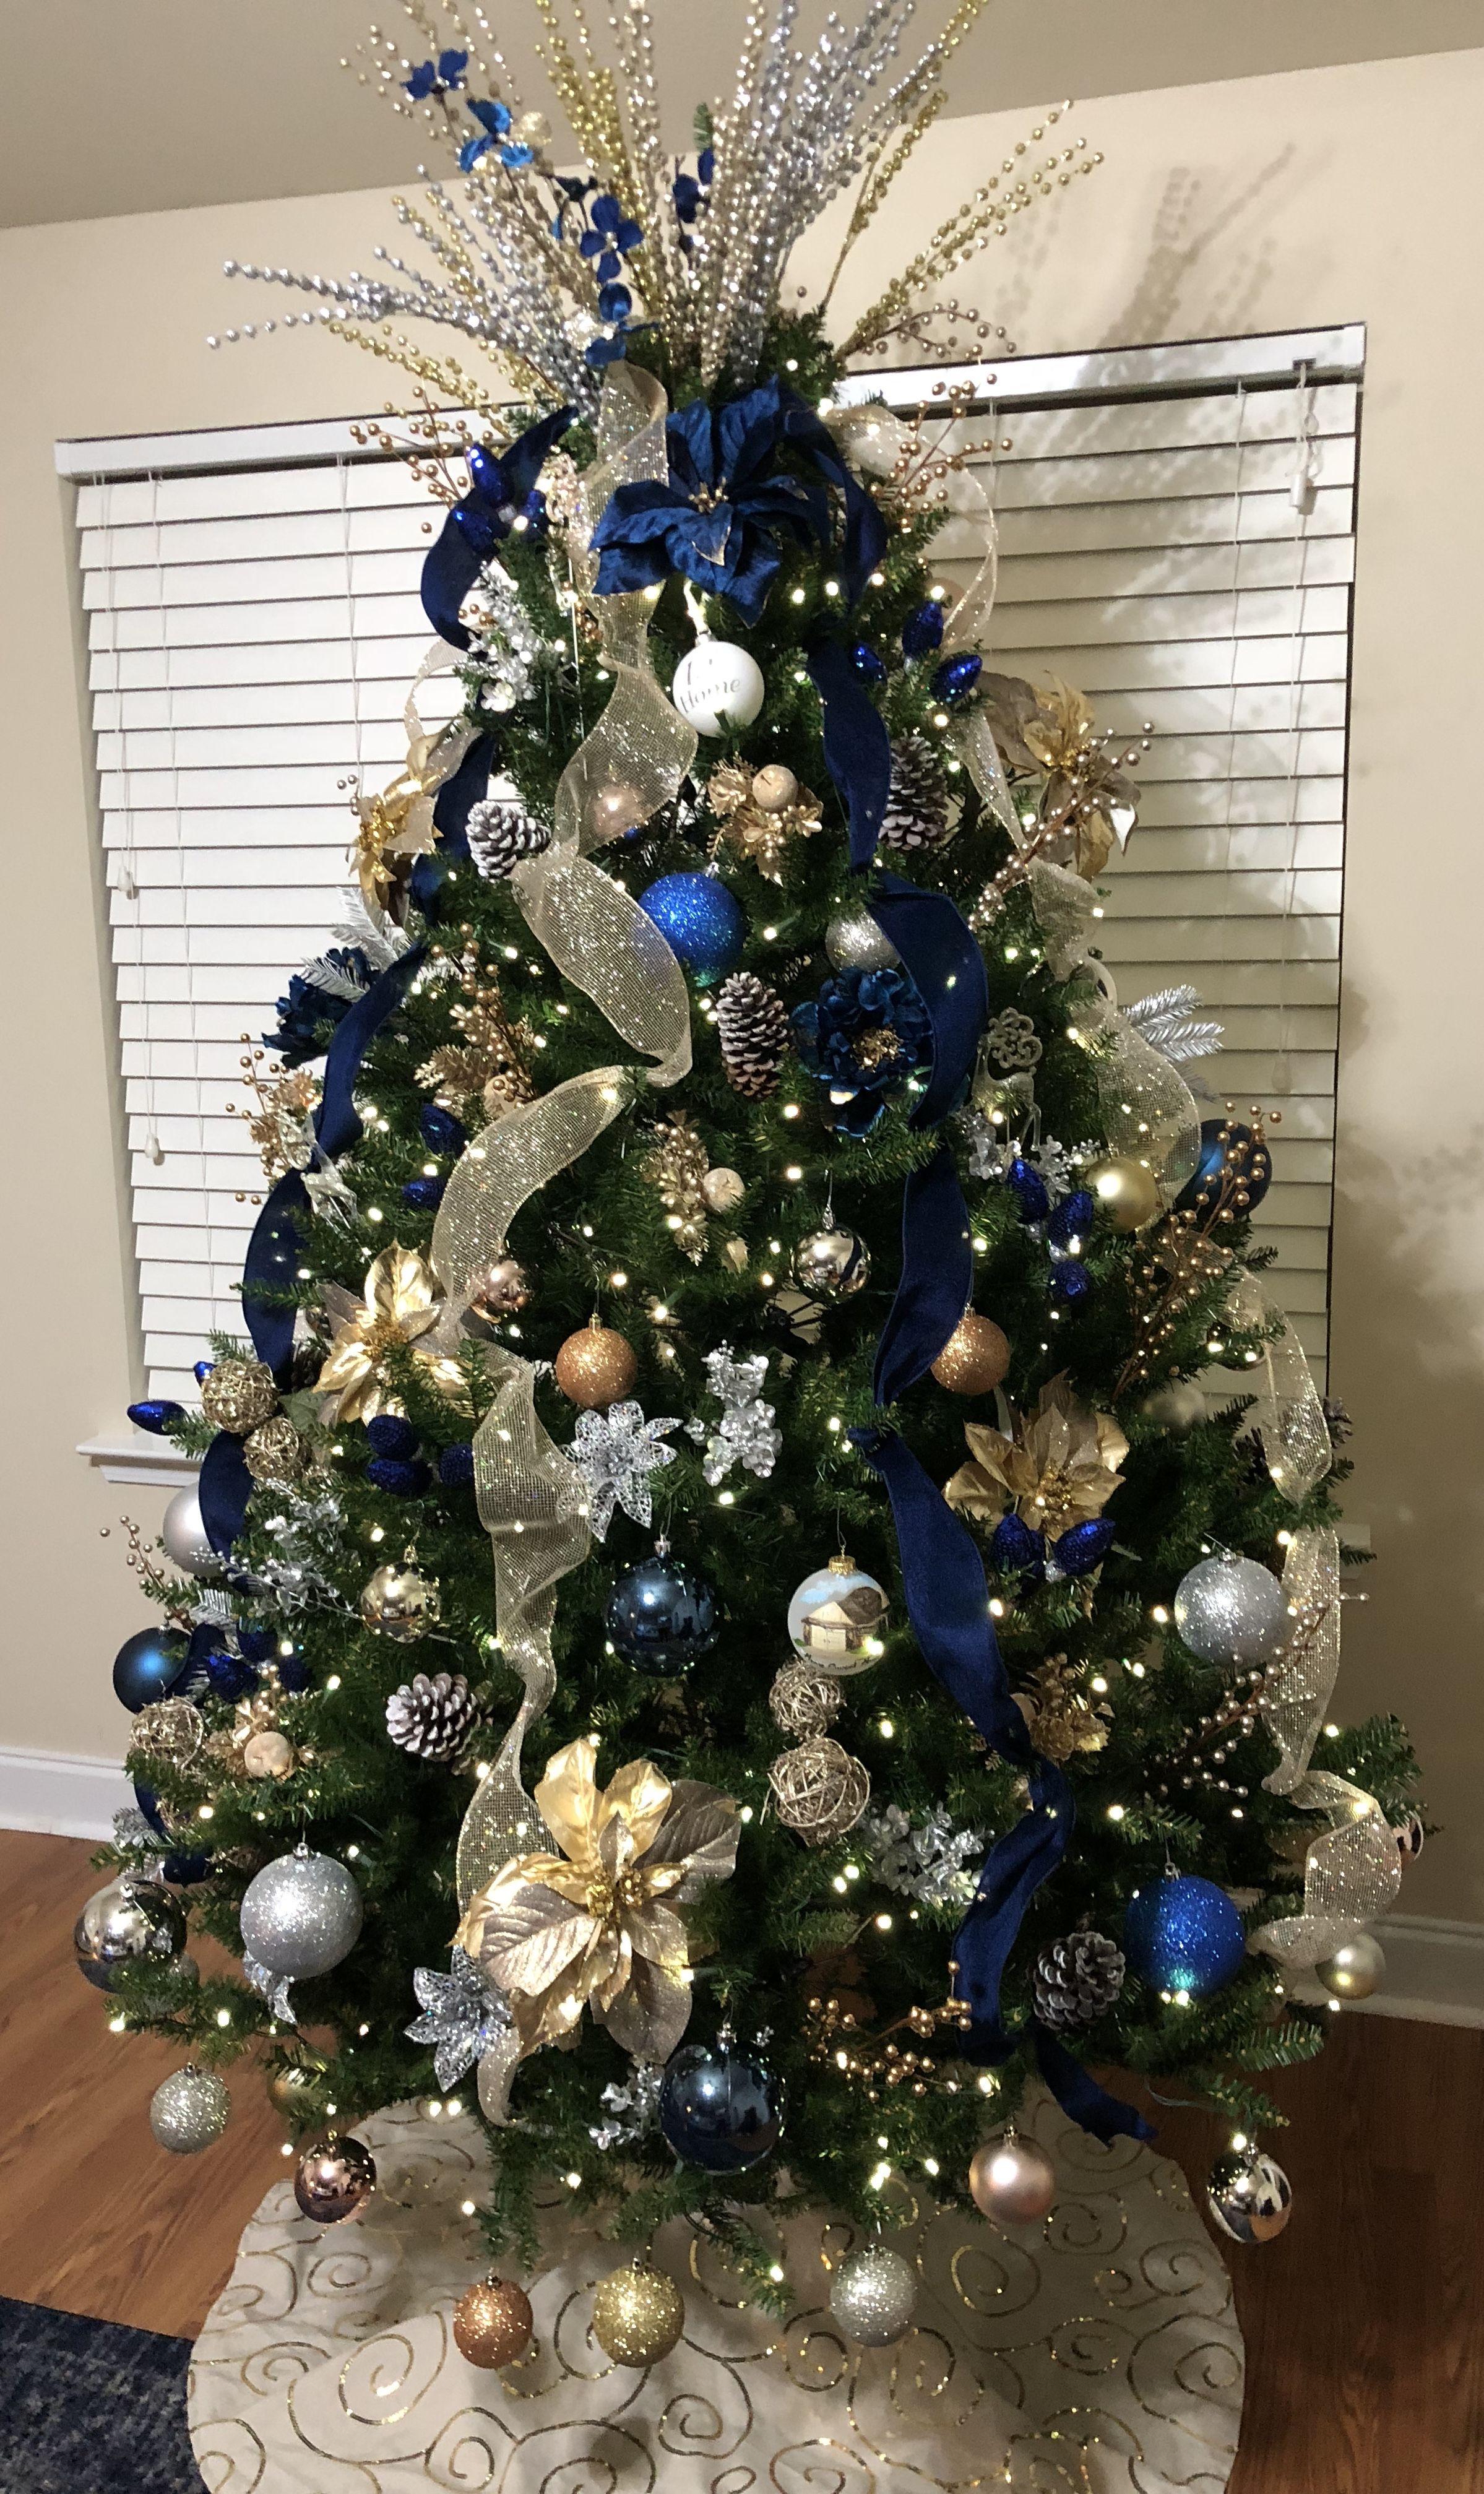 Blue And Gold Christmas Tree Blue Christmas Tree Decorations Gold Christmas Tree Decorations Blue Christmas Tree